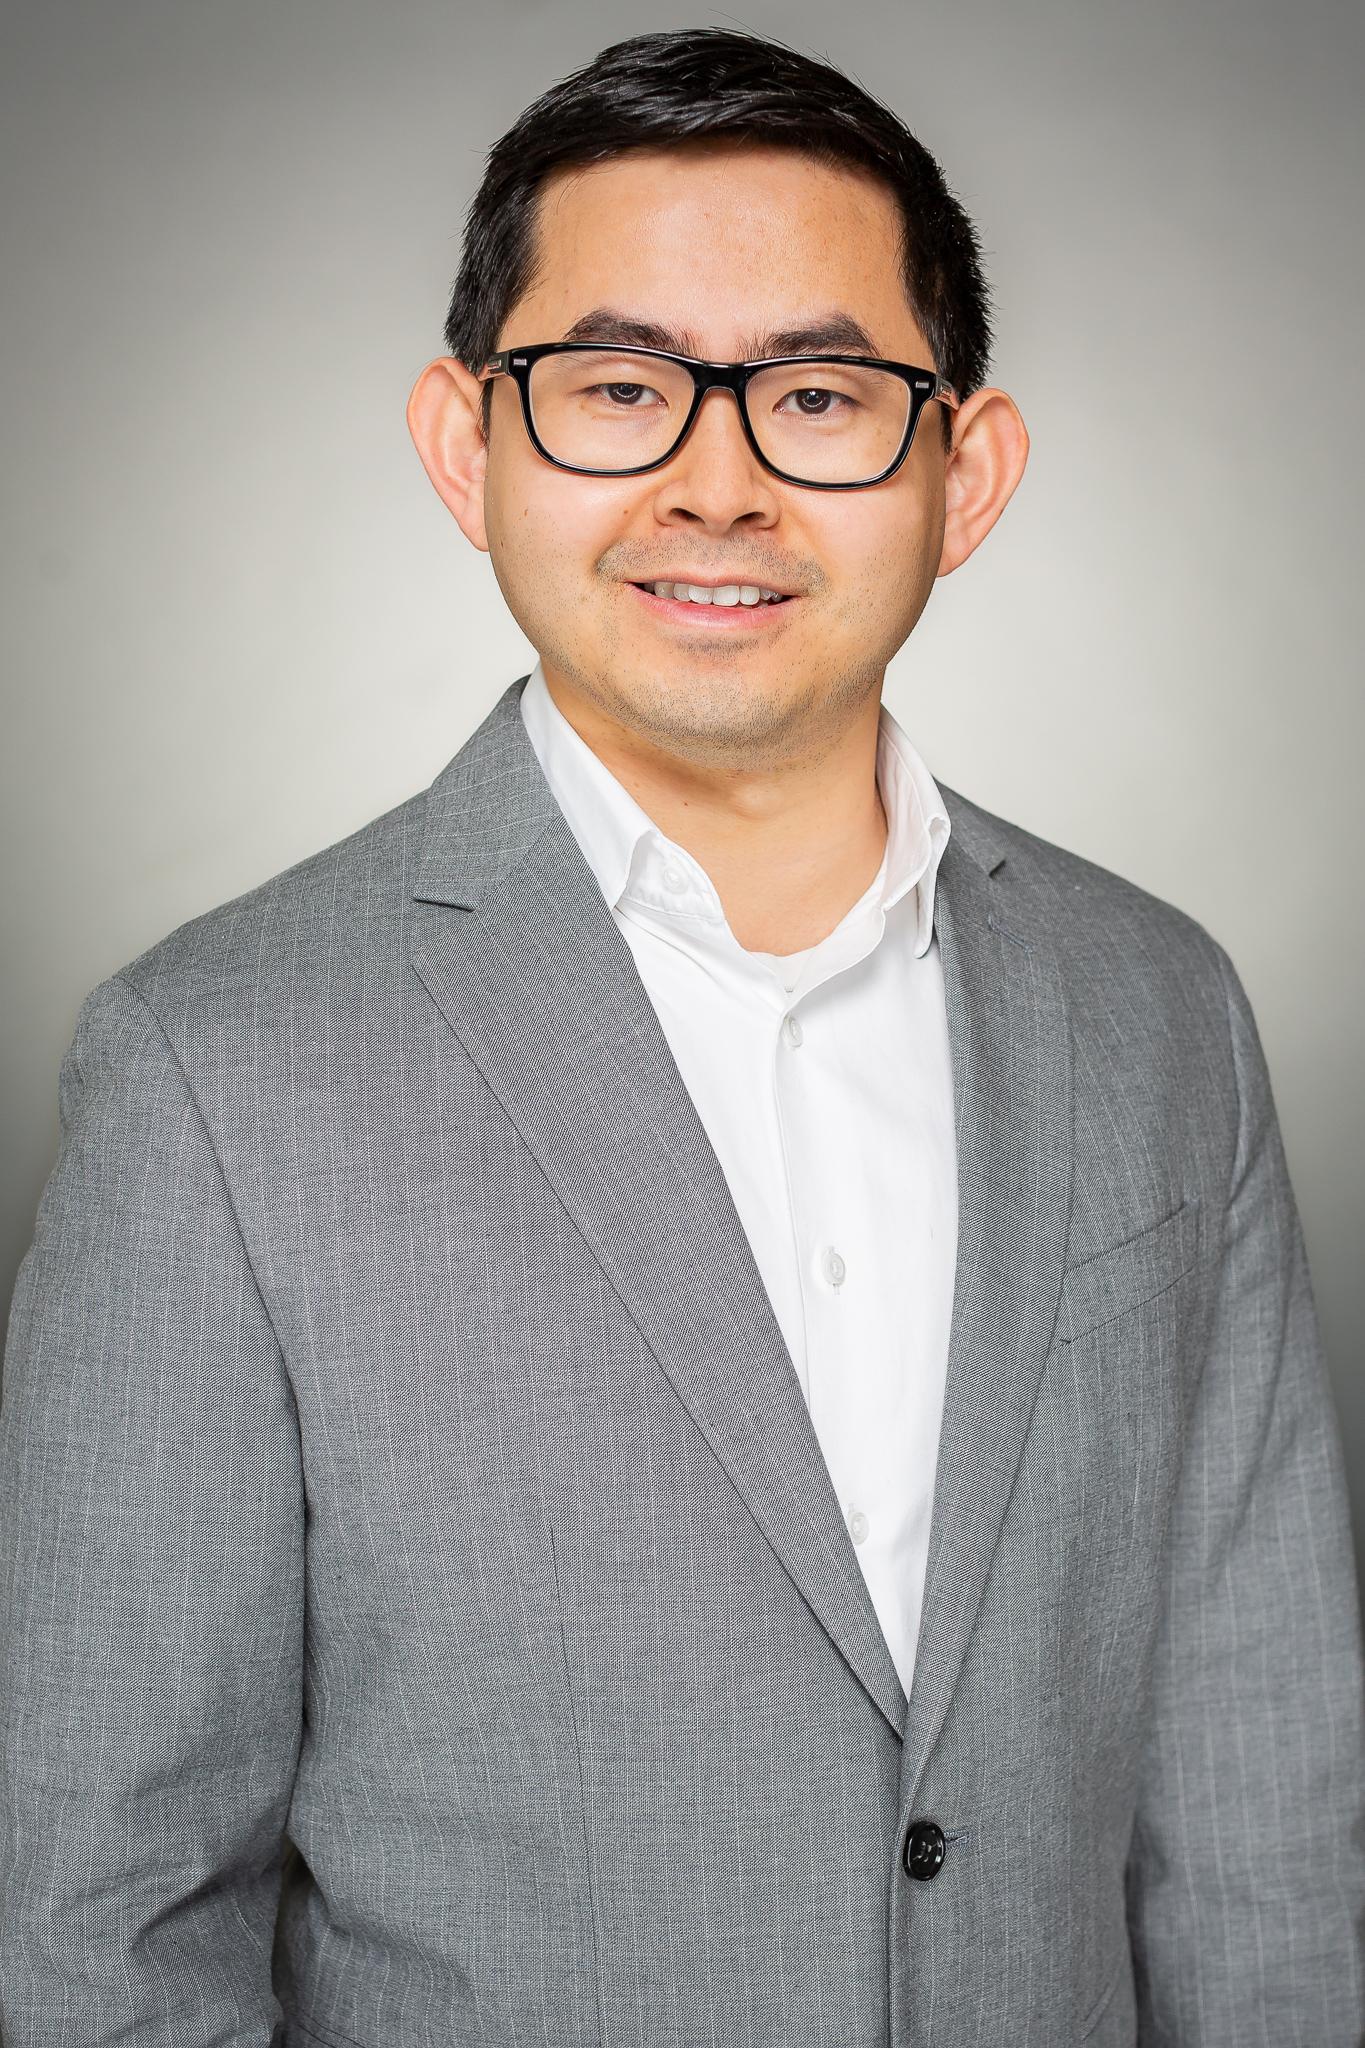 Thach_Nguyen_Headshot-1.jpg